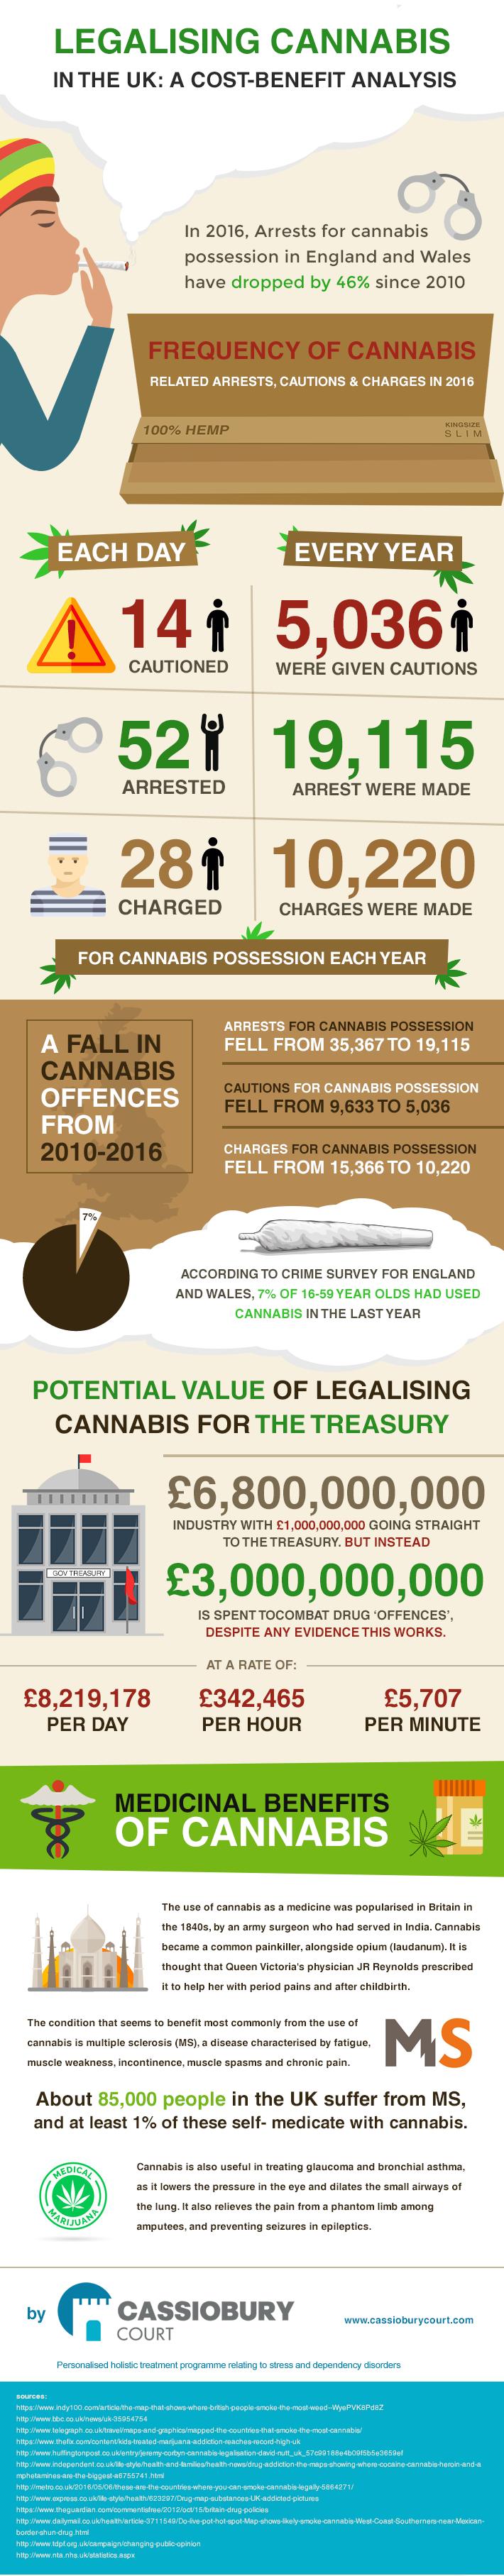 Cannabis Cost Benefit Analysis U.K.